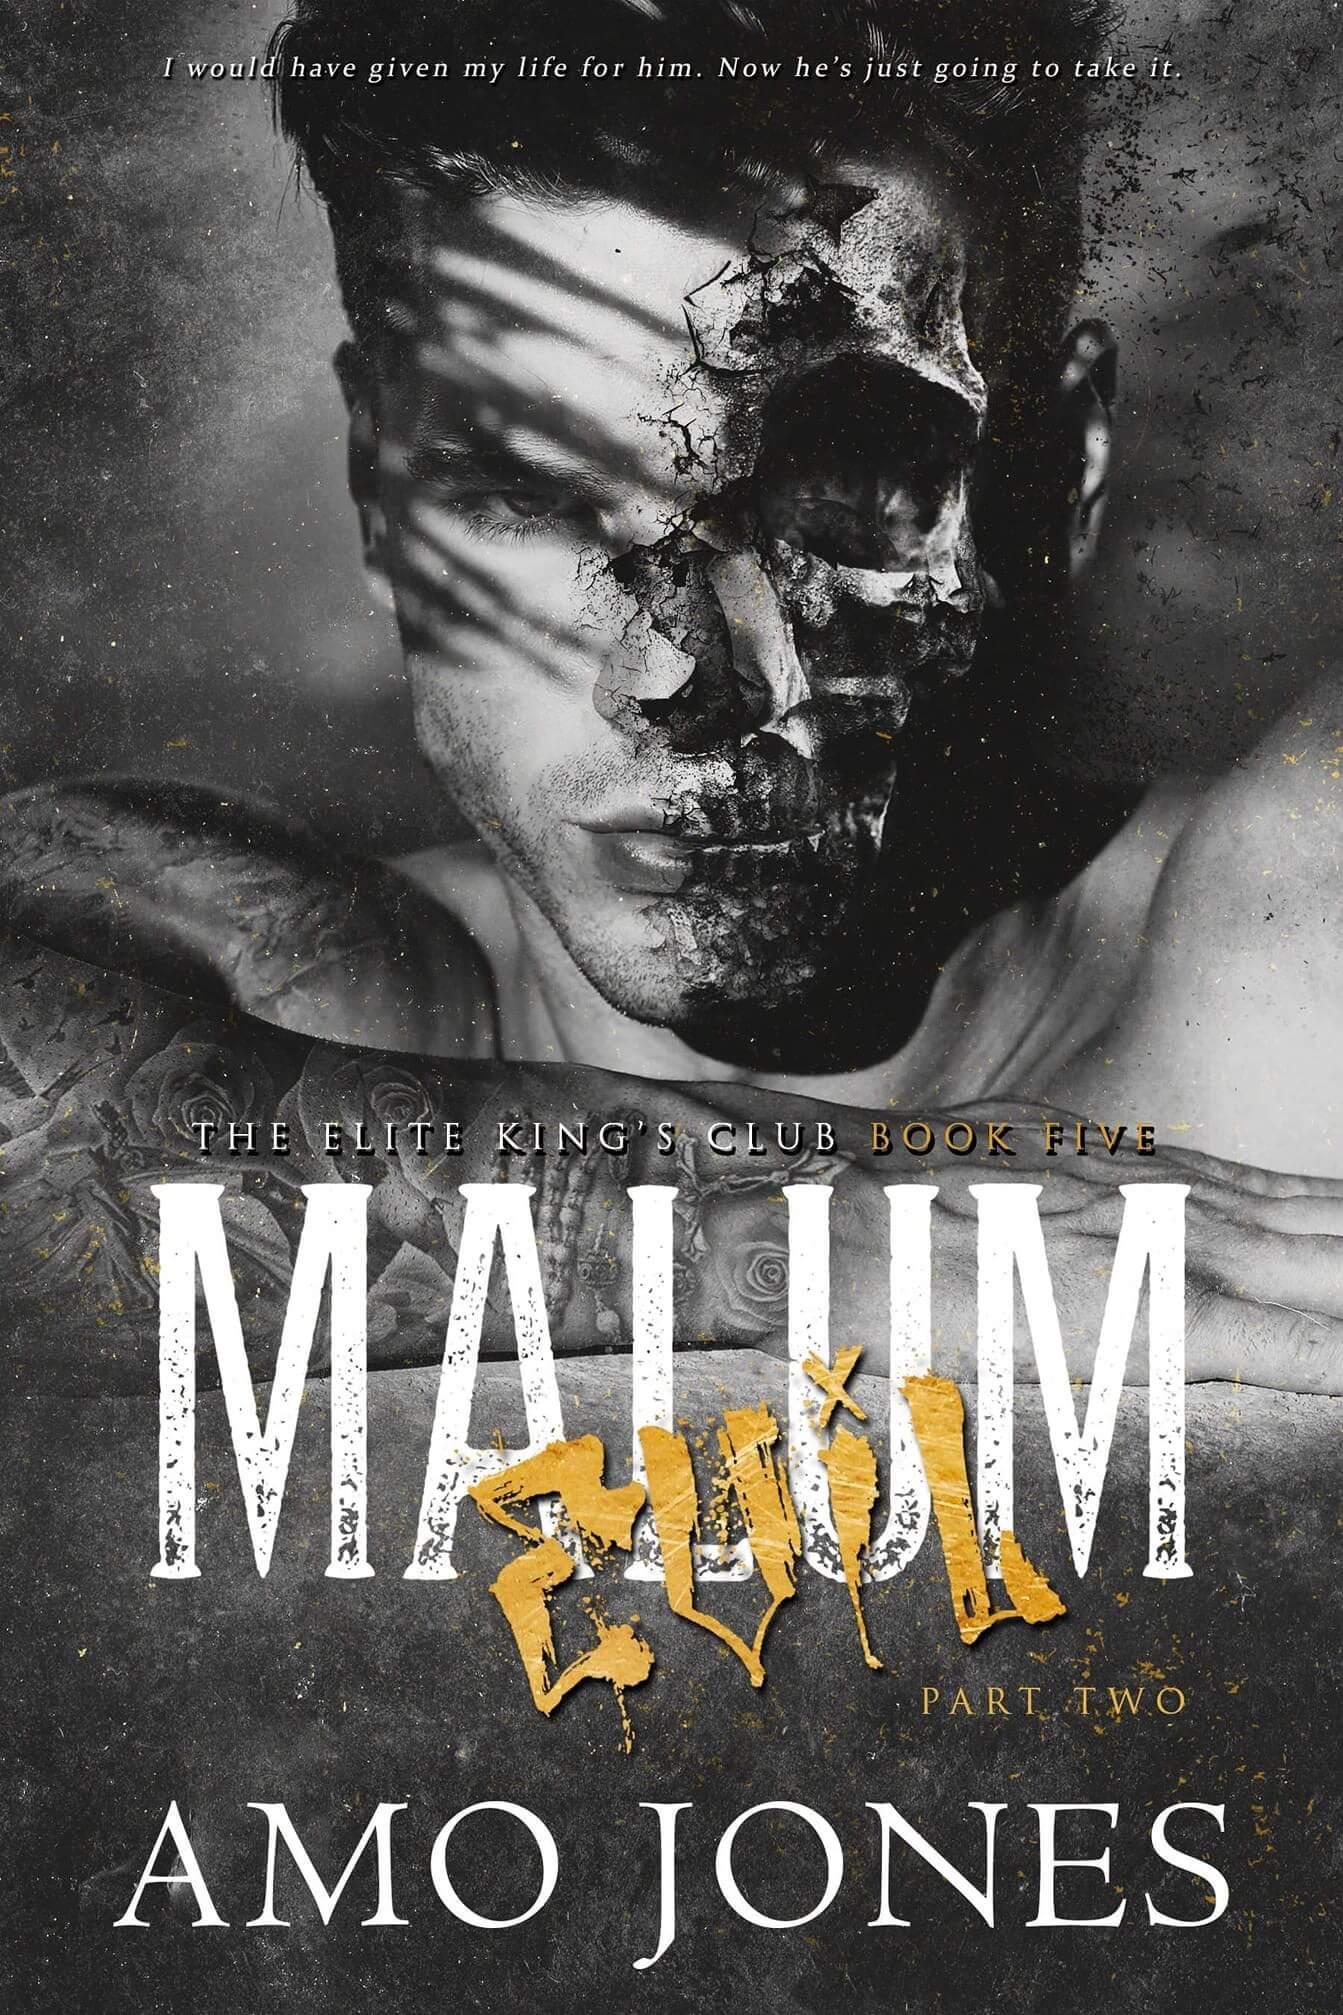 Hot Cover Reveal * Malum: Part 2 (Elite Kings series book 5) by Amo Jones * Coming June 11th